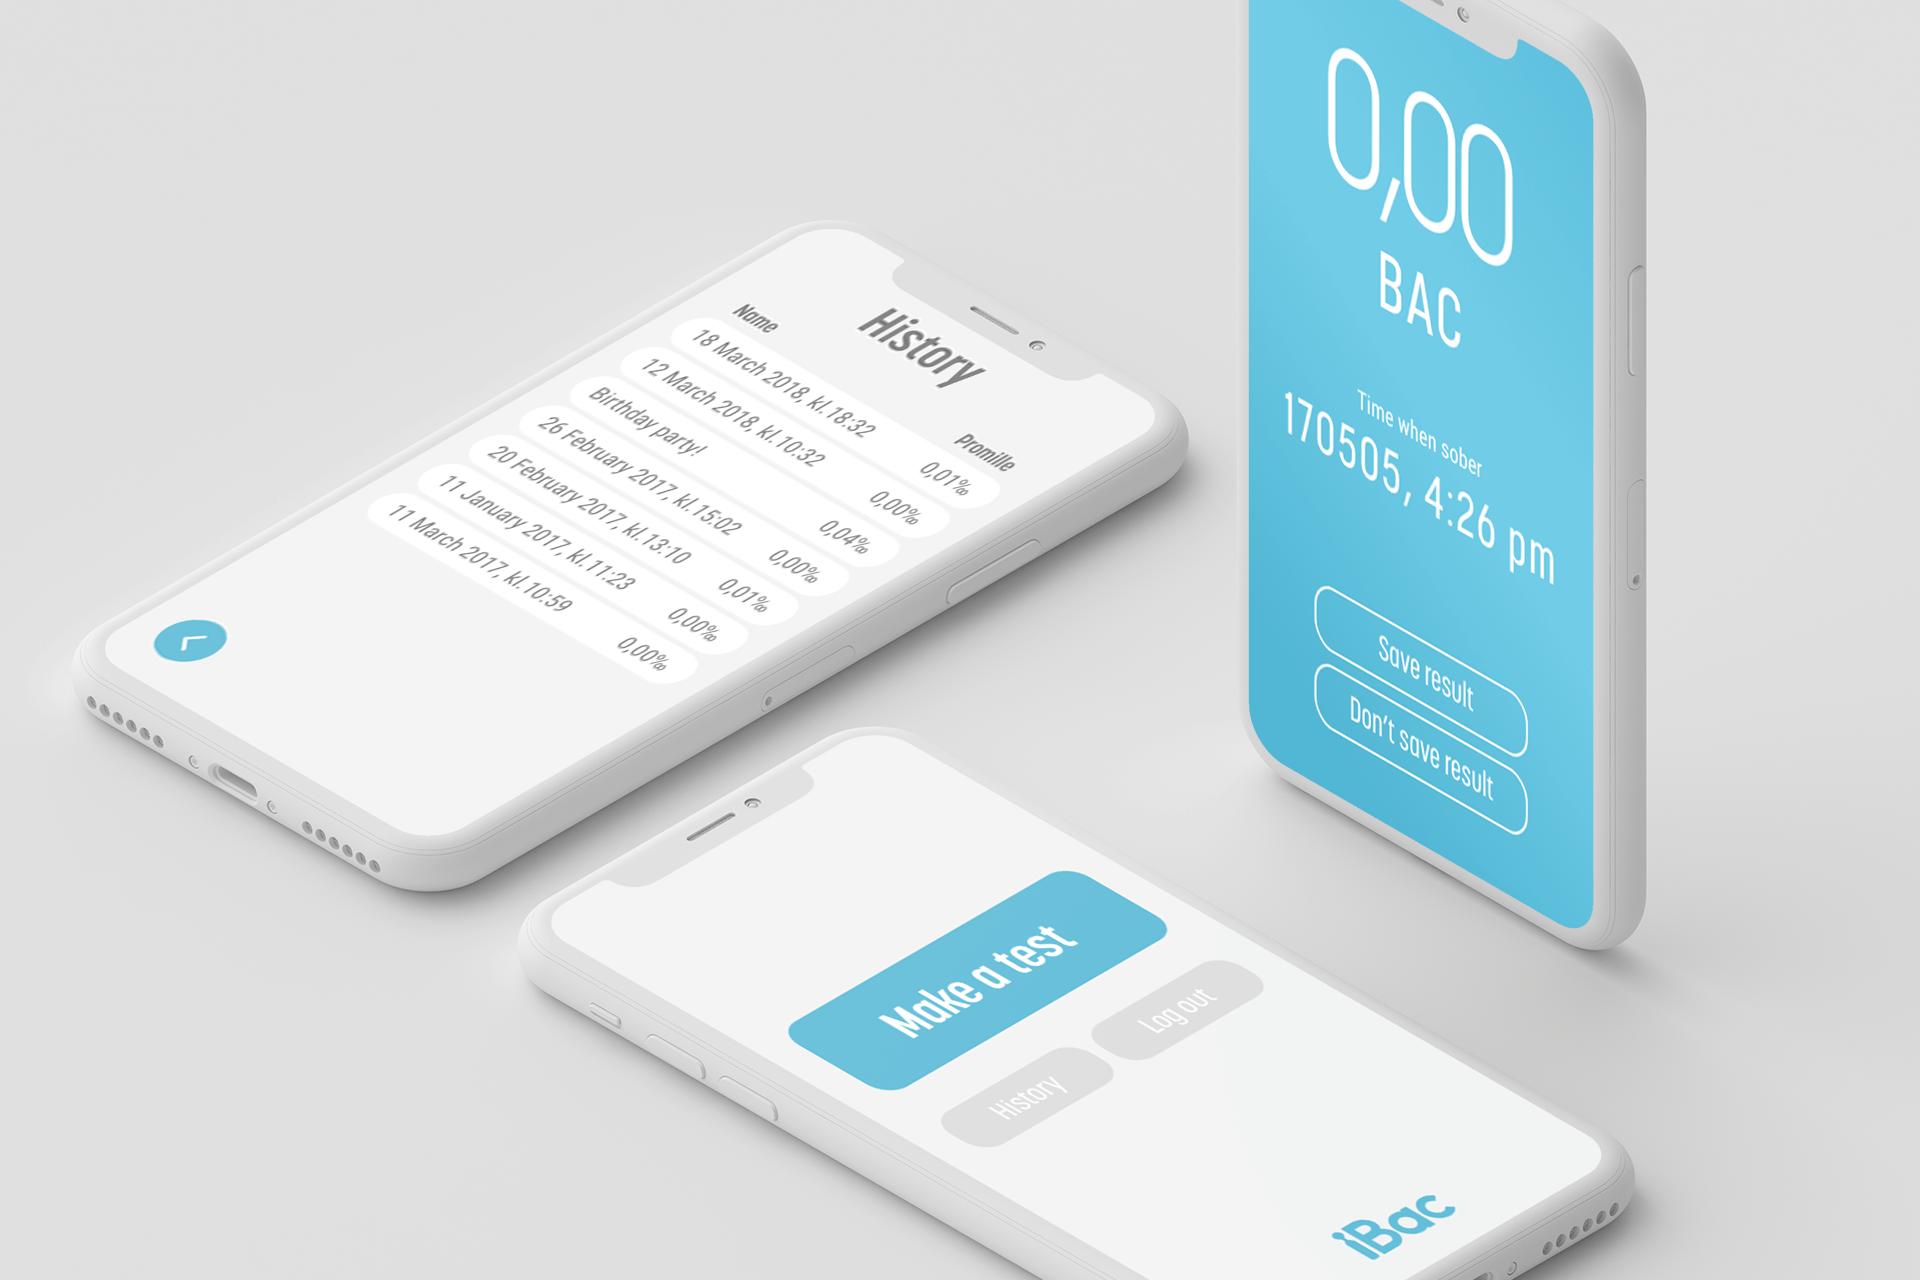 ibac-phone-Mockup.png